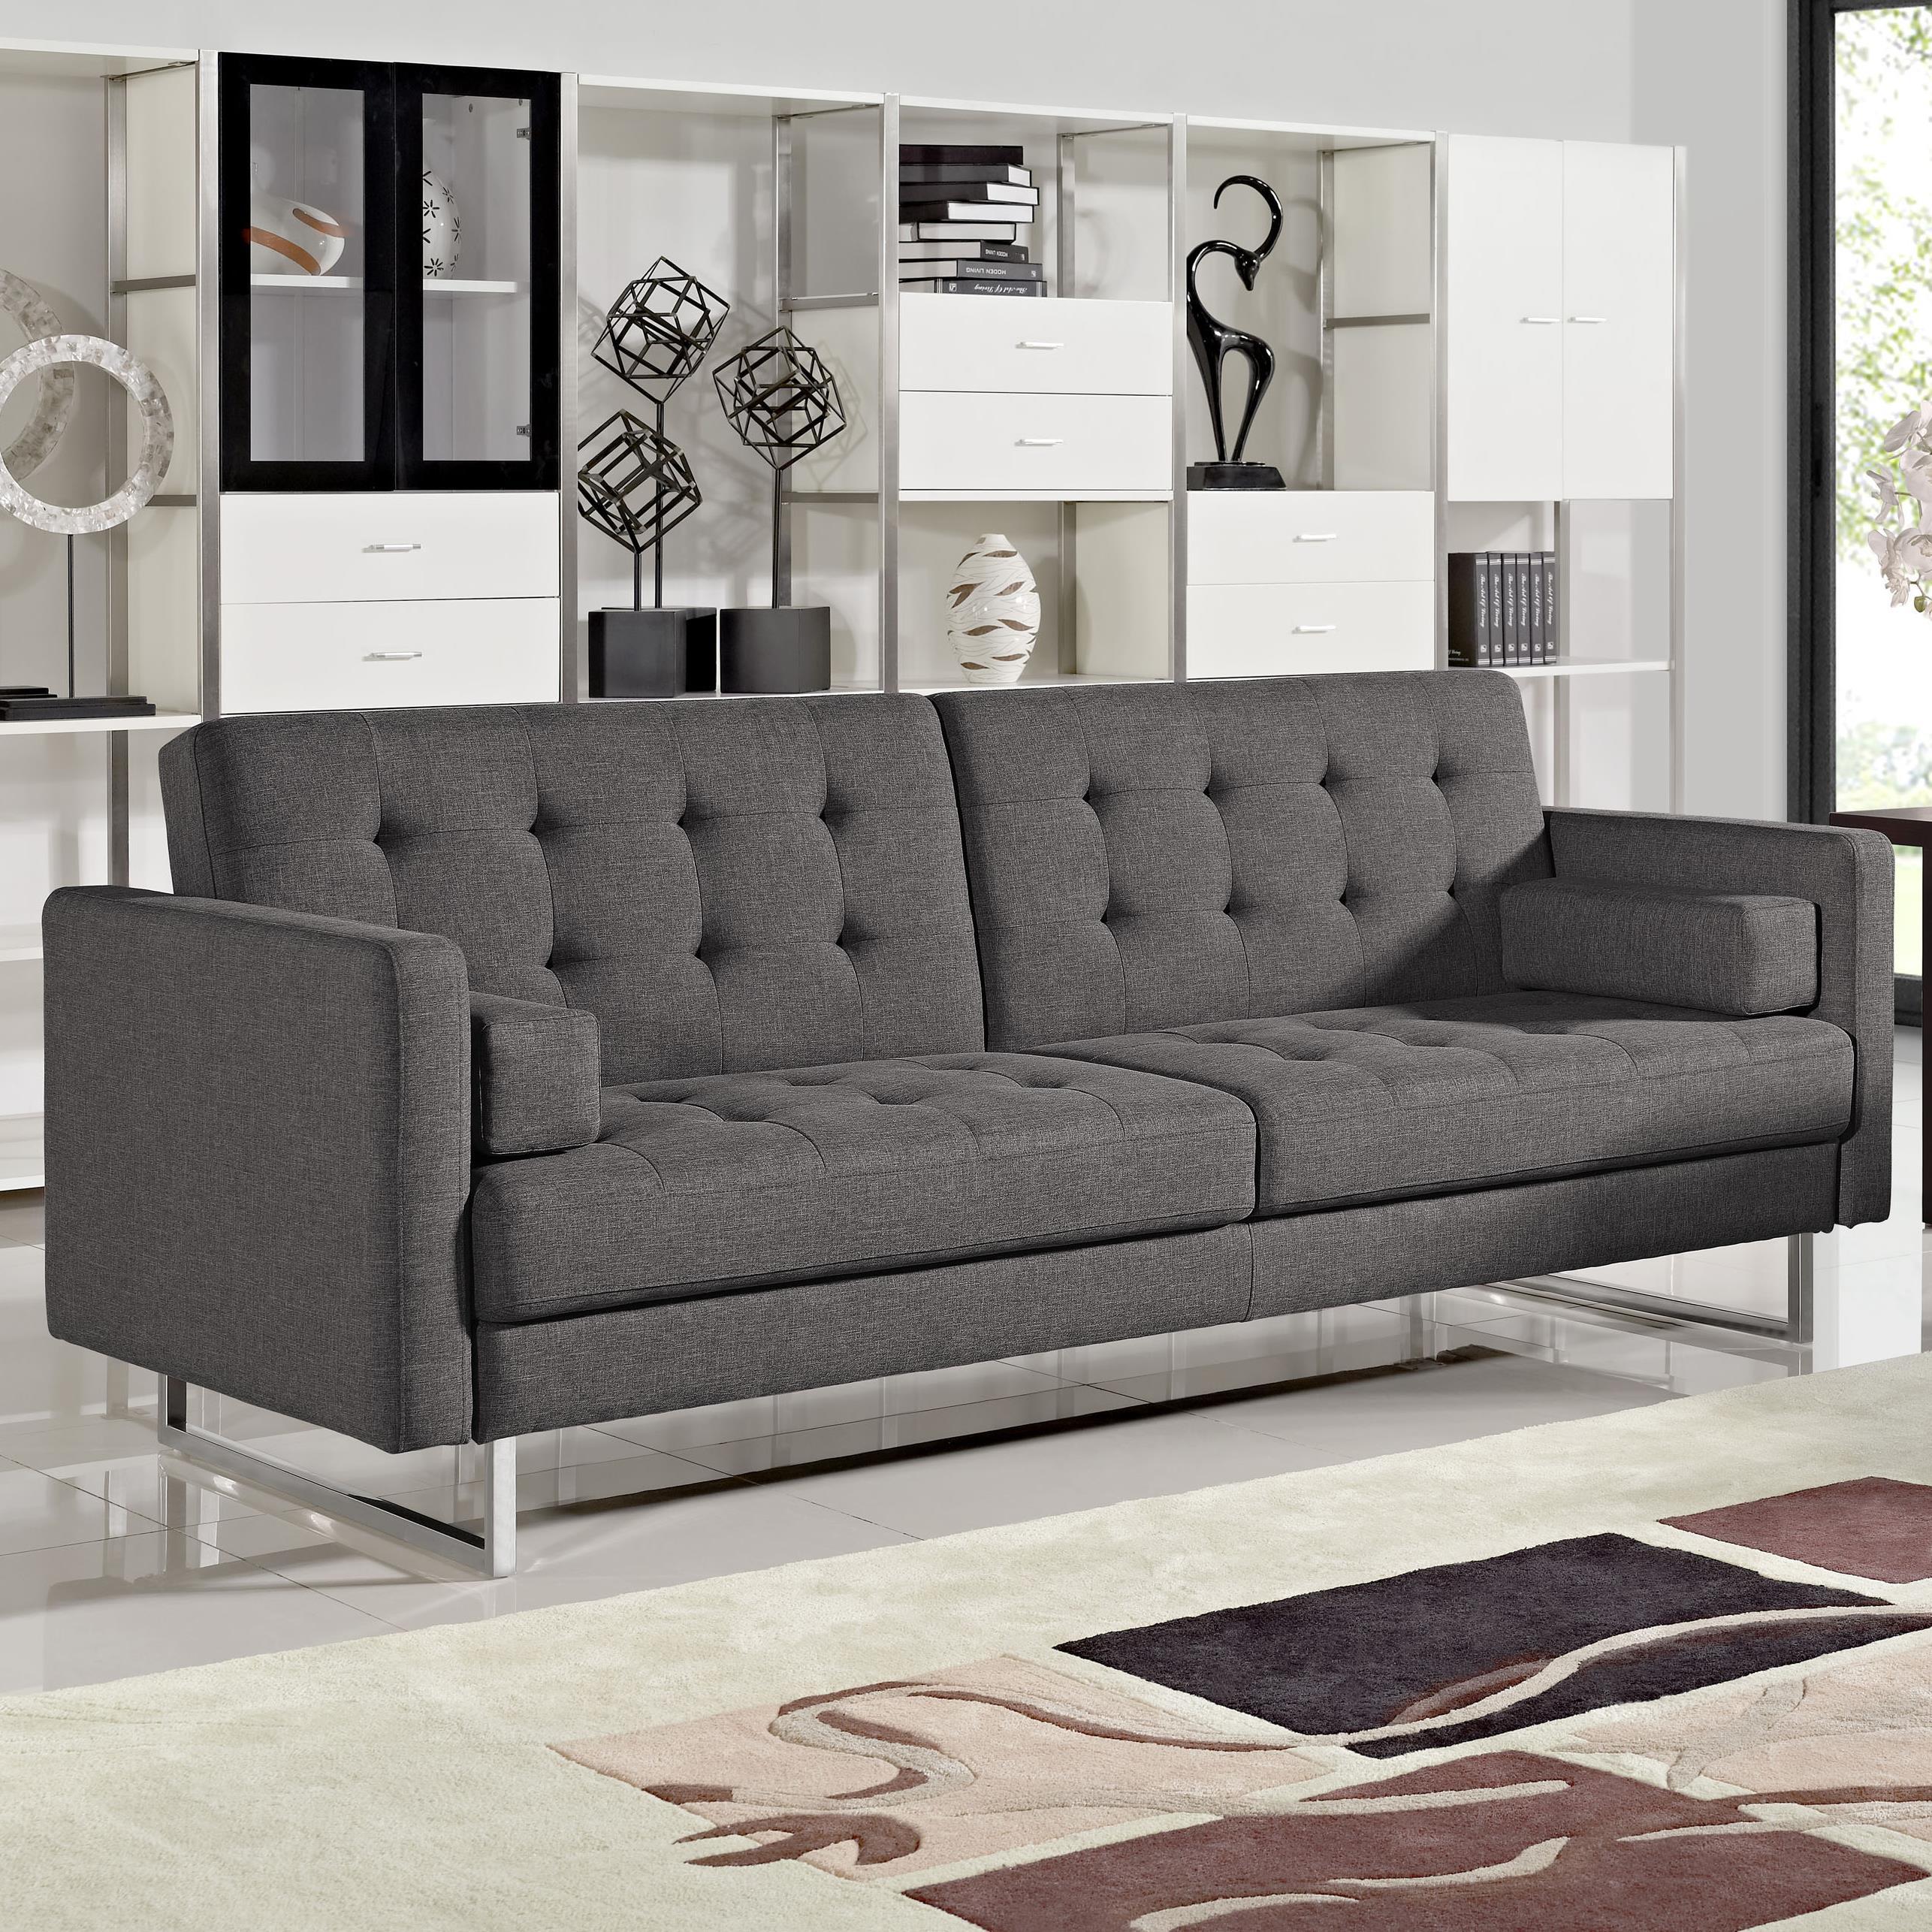 Diamond Sofa Opus Convertible Grey Tufted Polyester Fabric